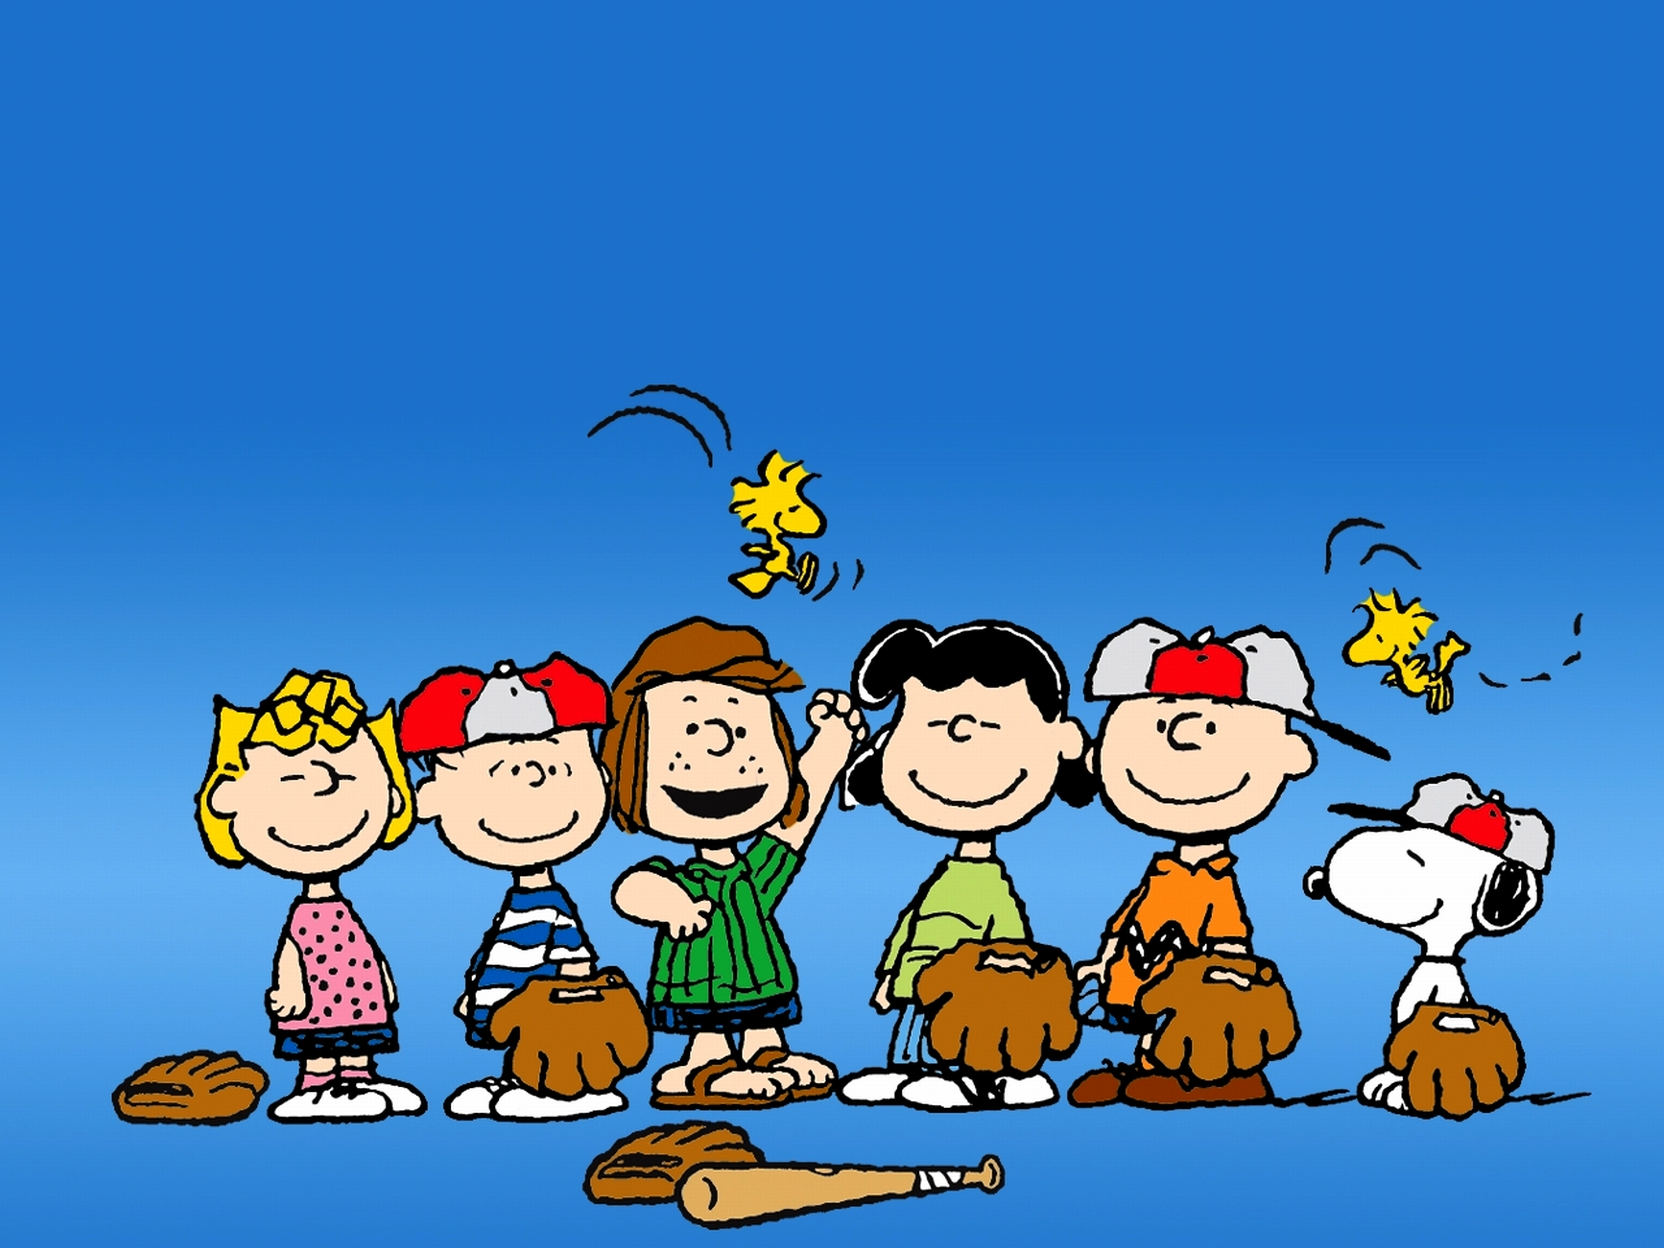 Charlie Brown Wallpaper 14842 1664x1248 px 1664x1248